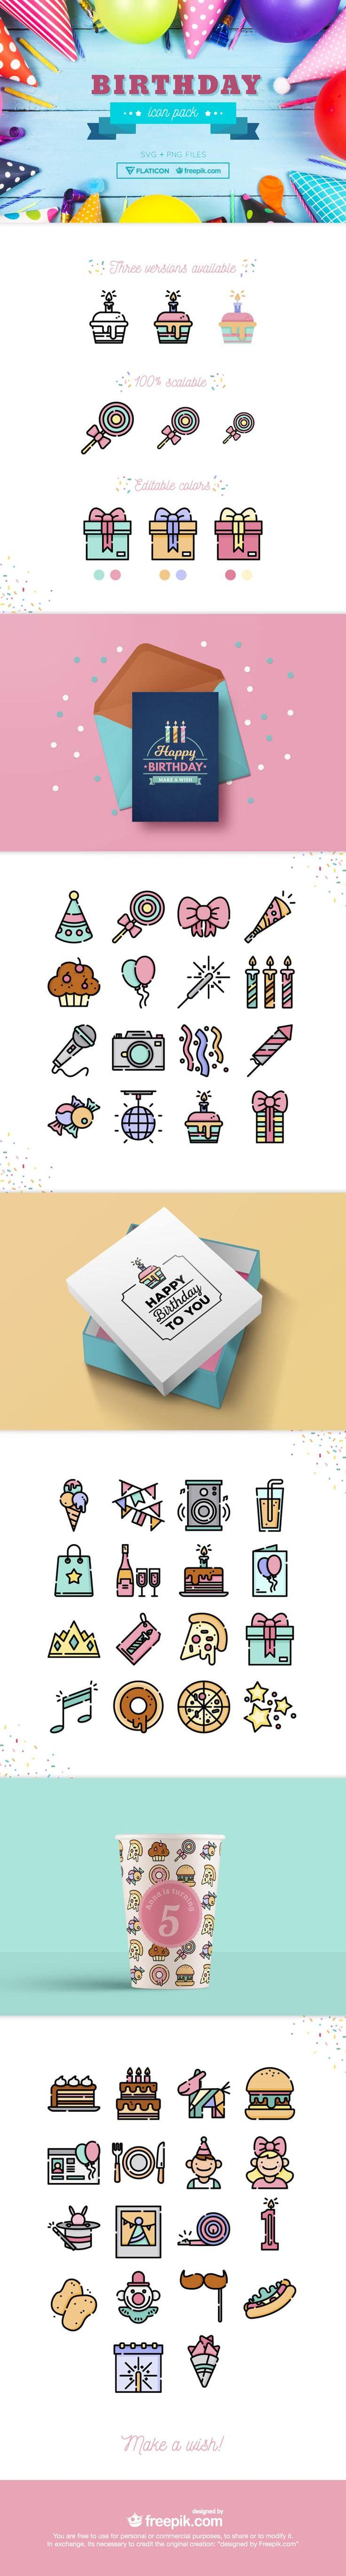 free birthday icons